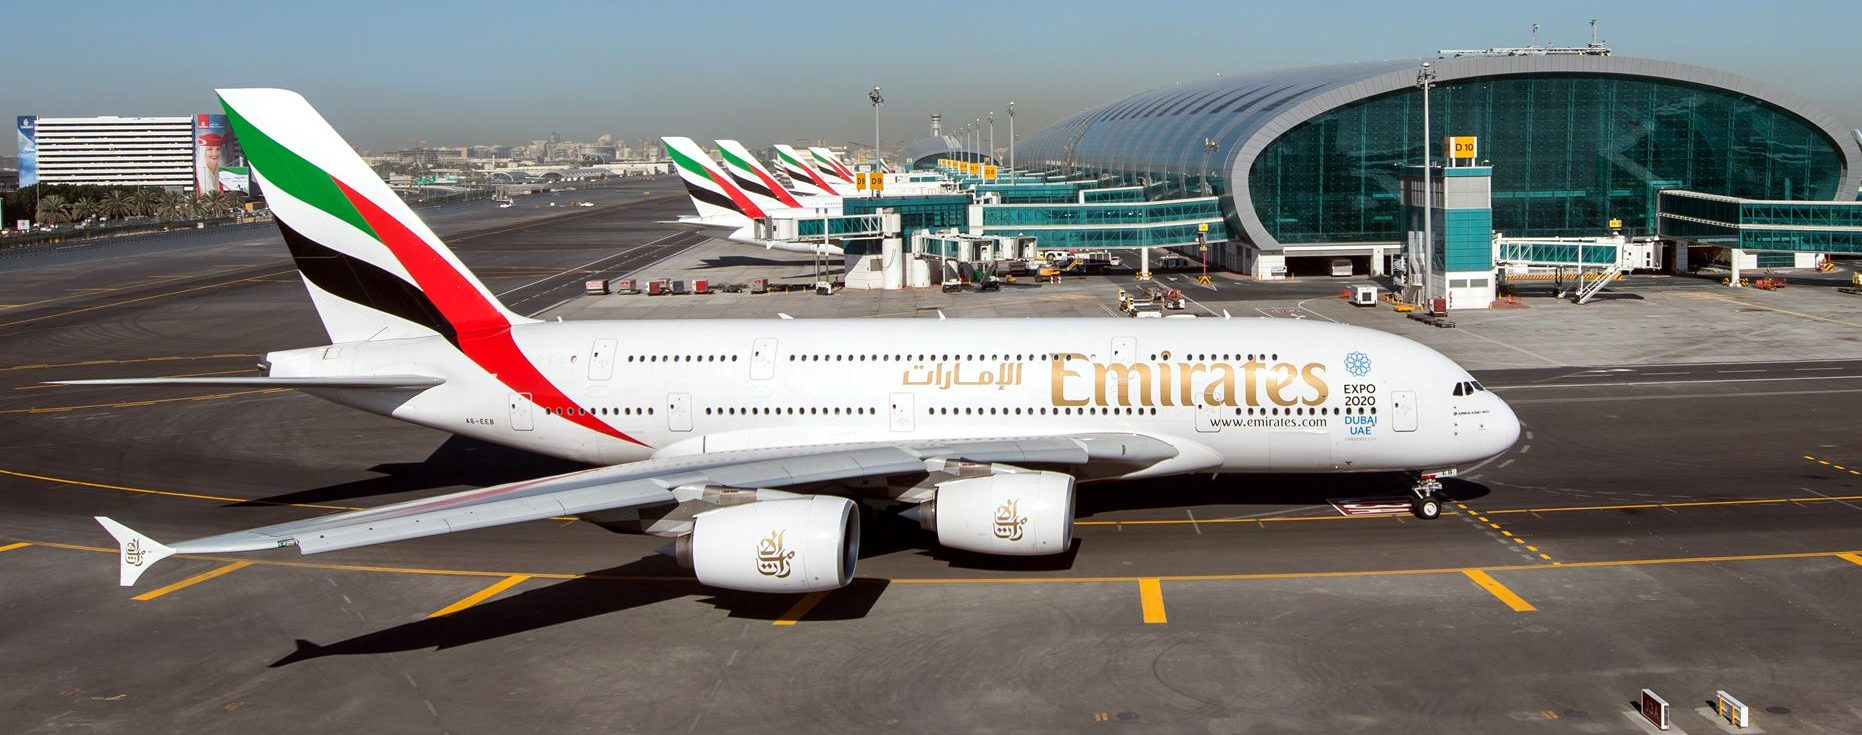 FOTO: Stoti Airbus A380 u floti aviokompanije Emirates